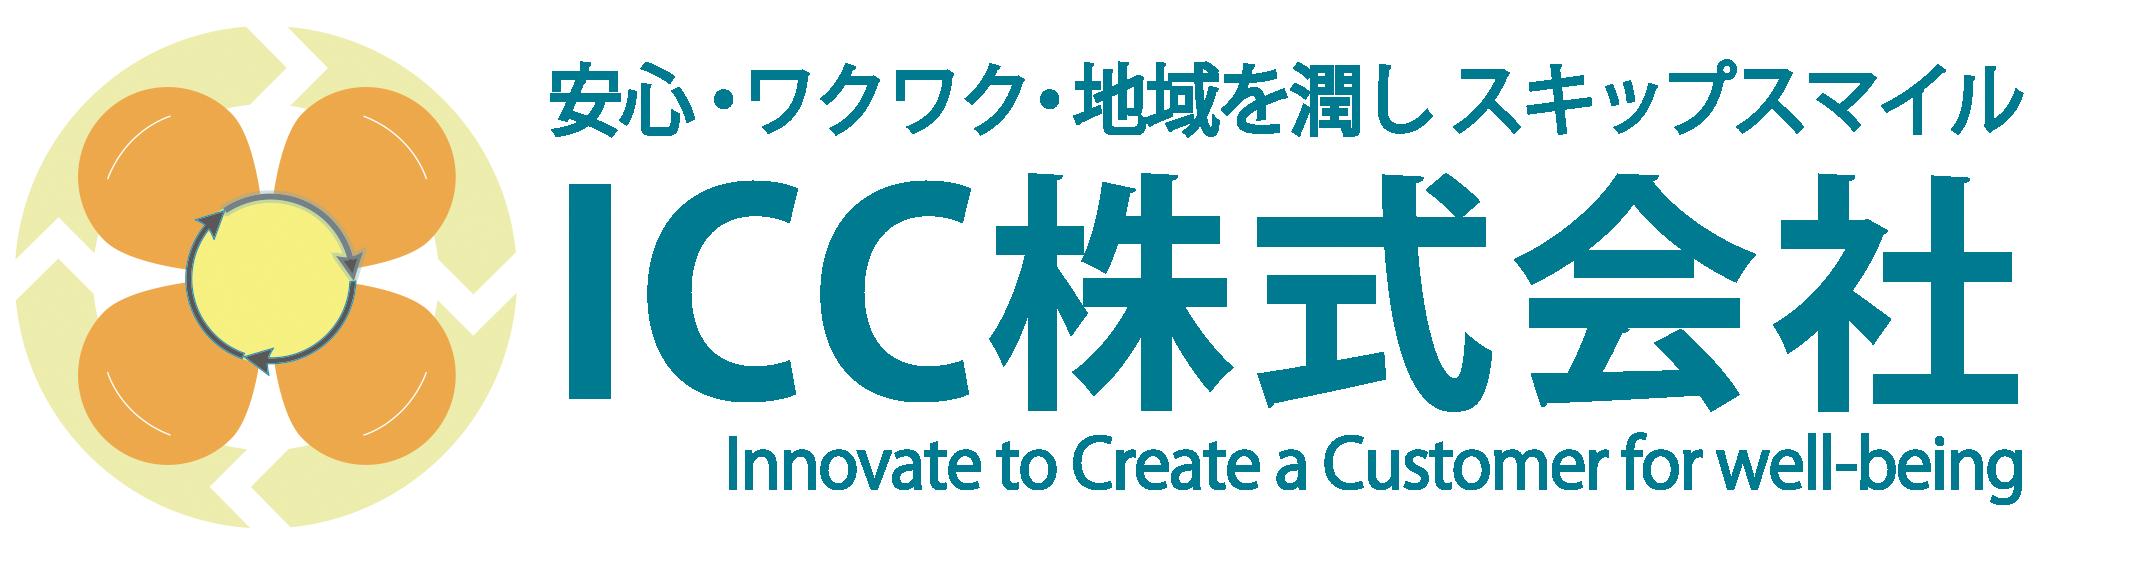 ICC株式会社(さいたま市)